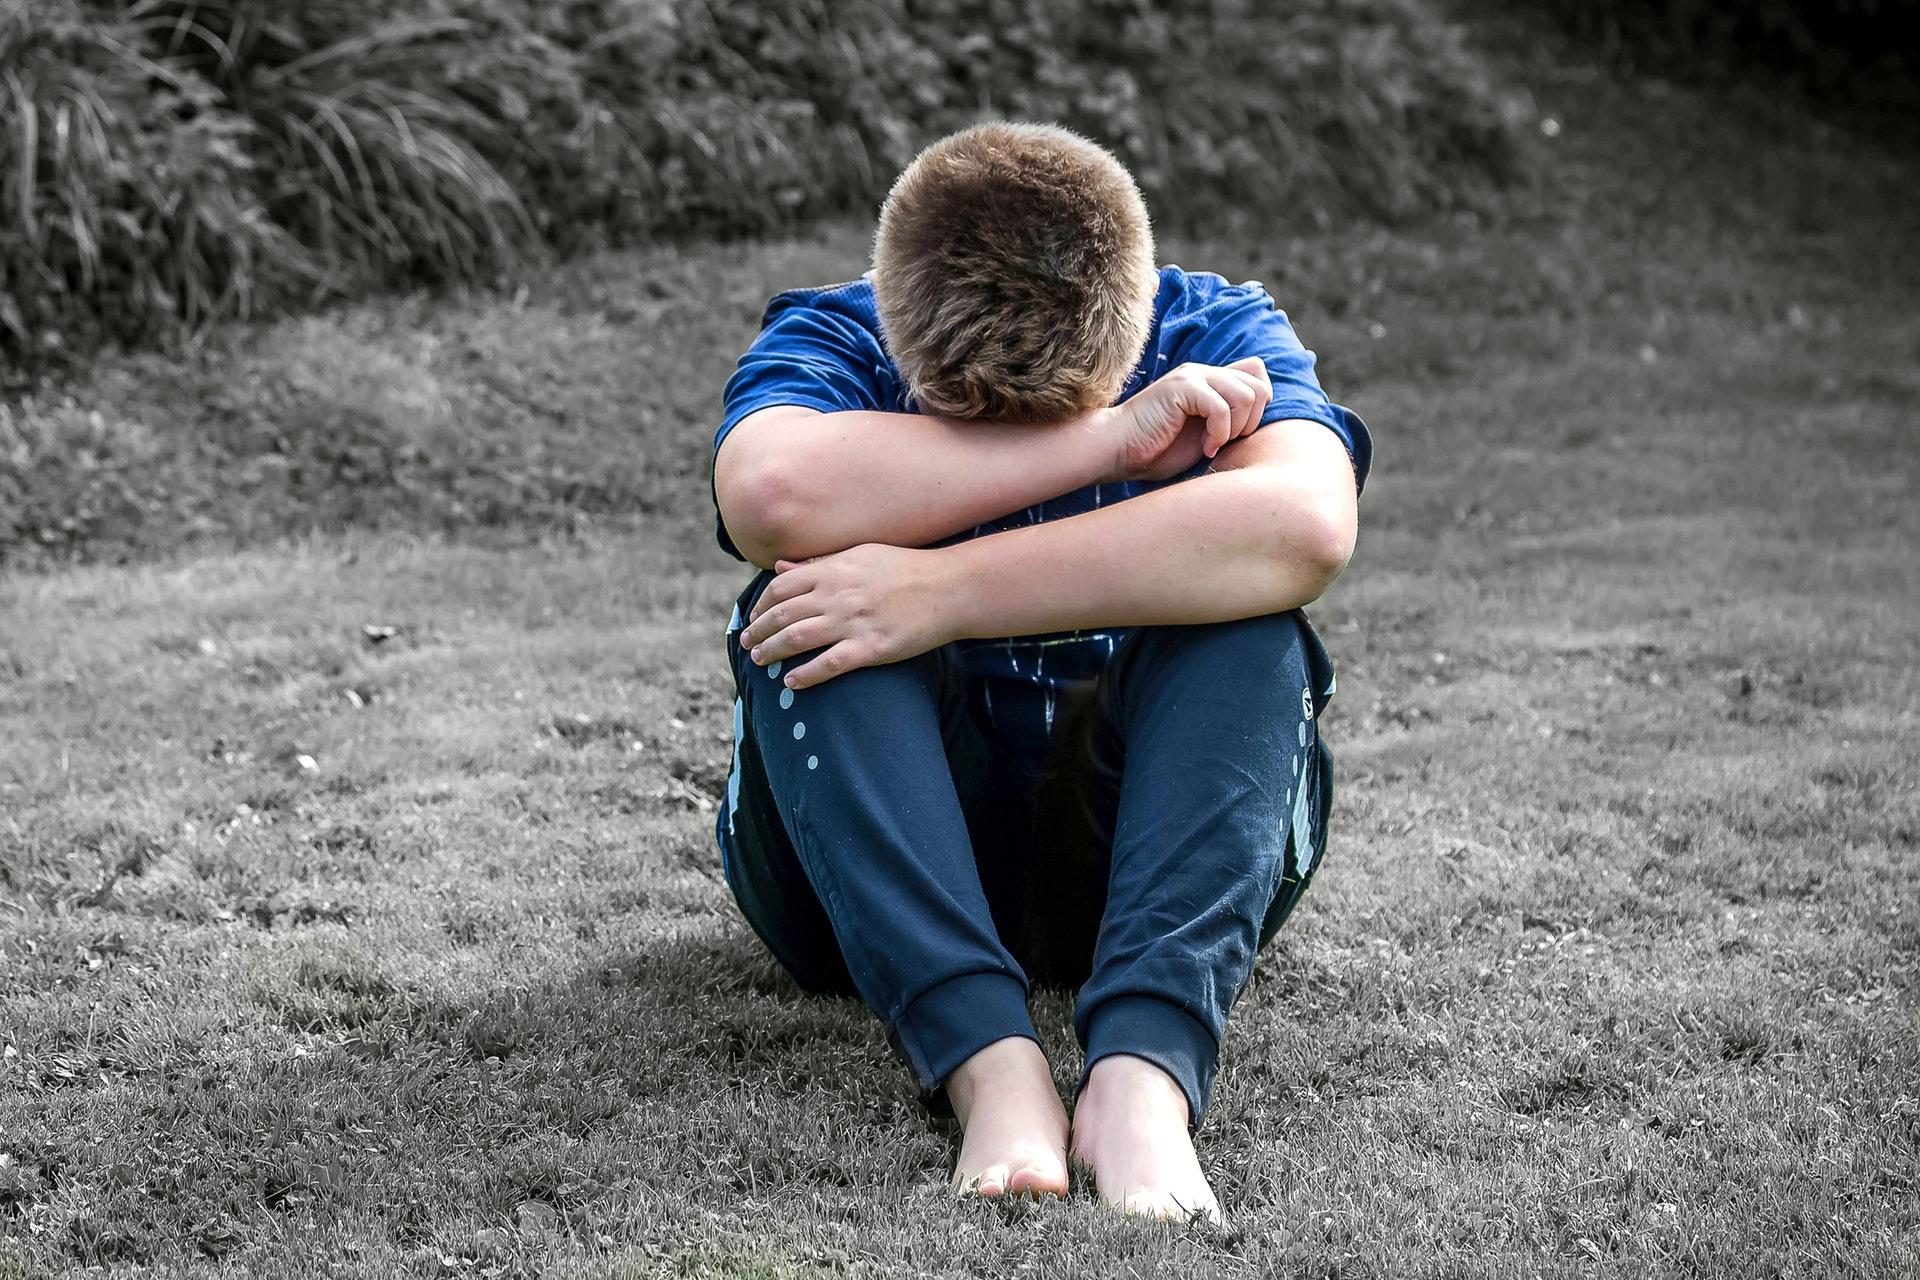 an image of depressed boy